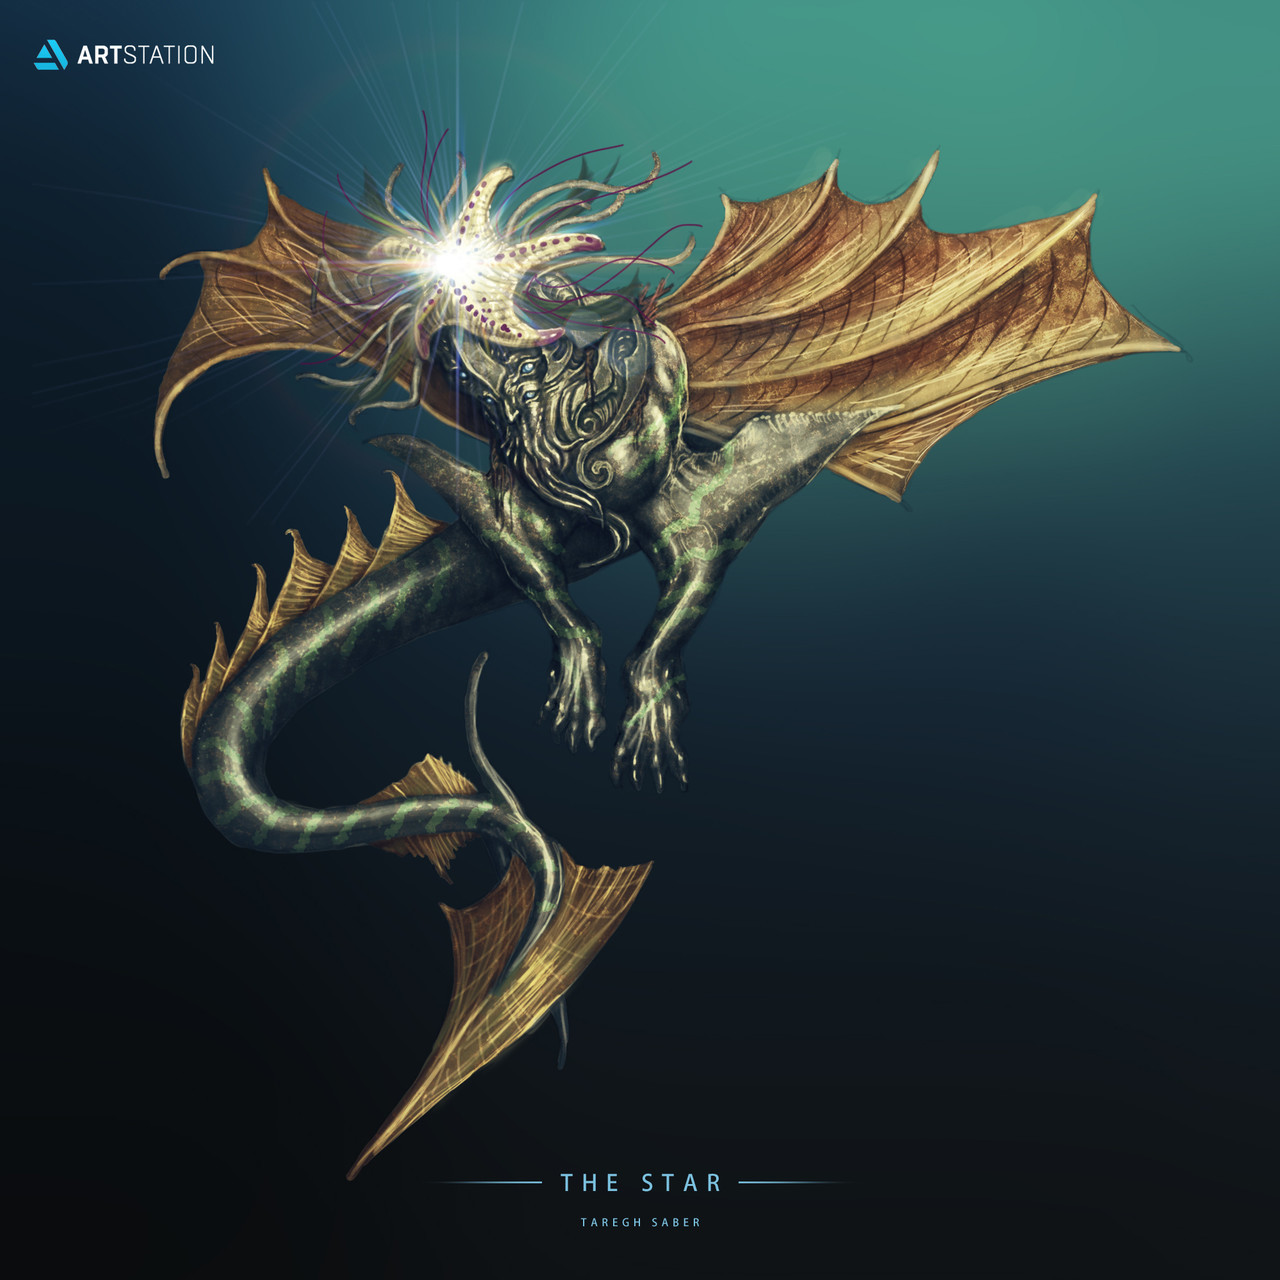 taregh-saber-star-sea-color-text